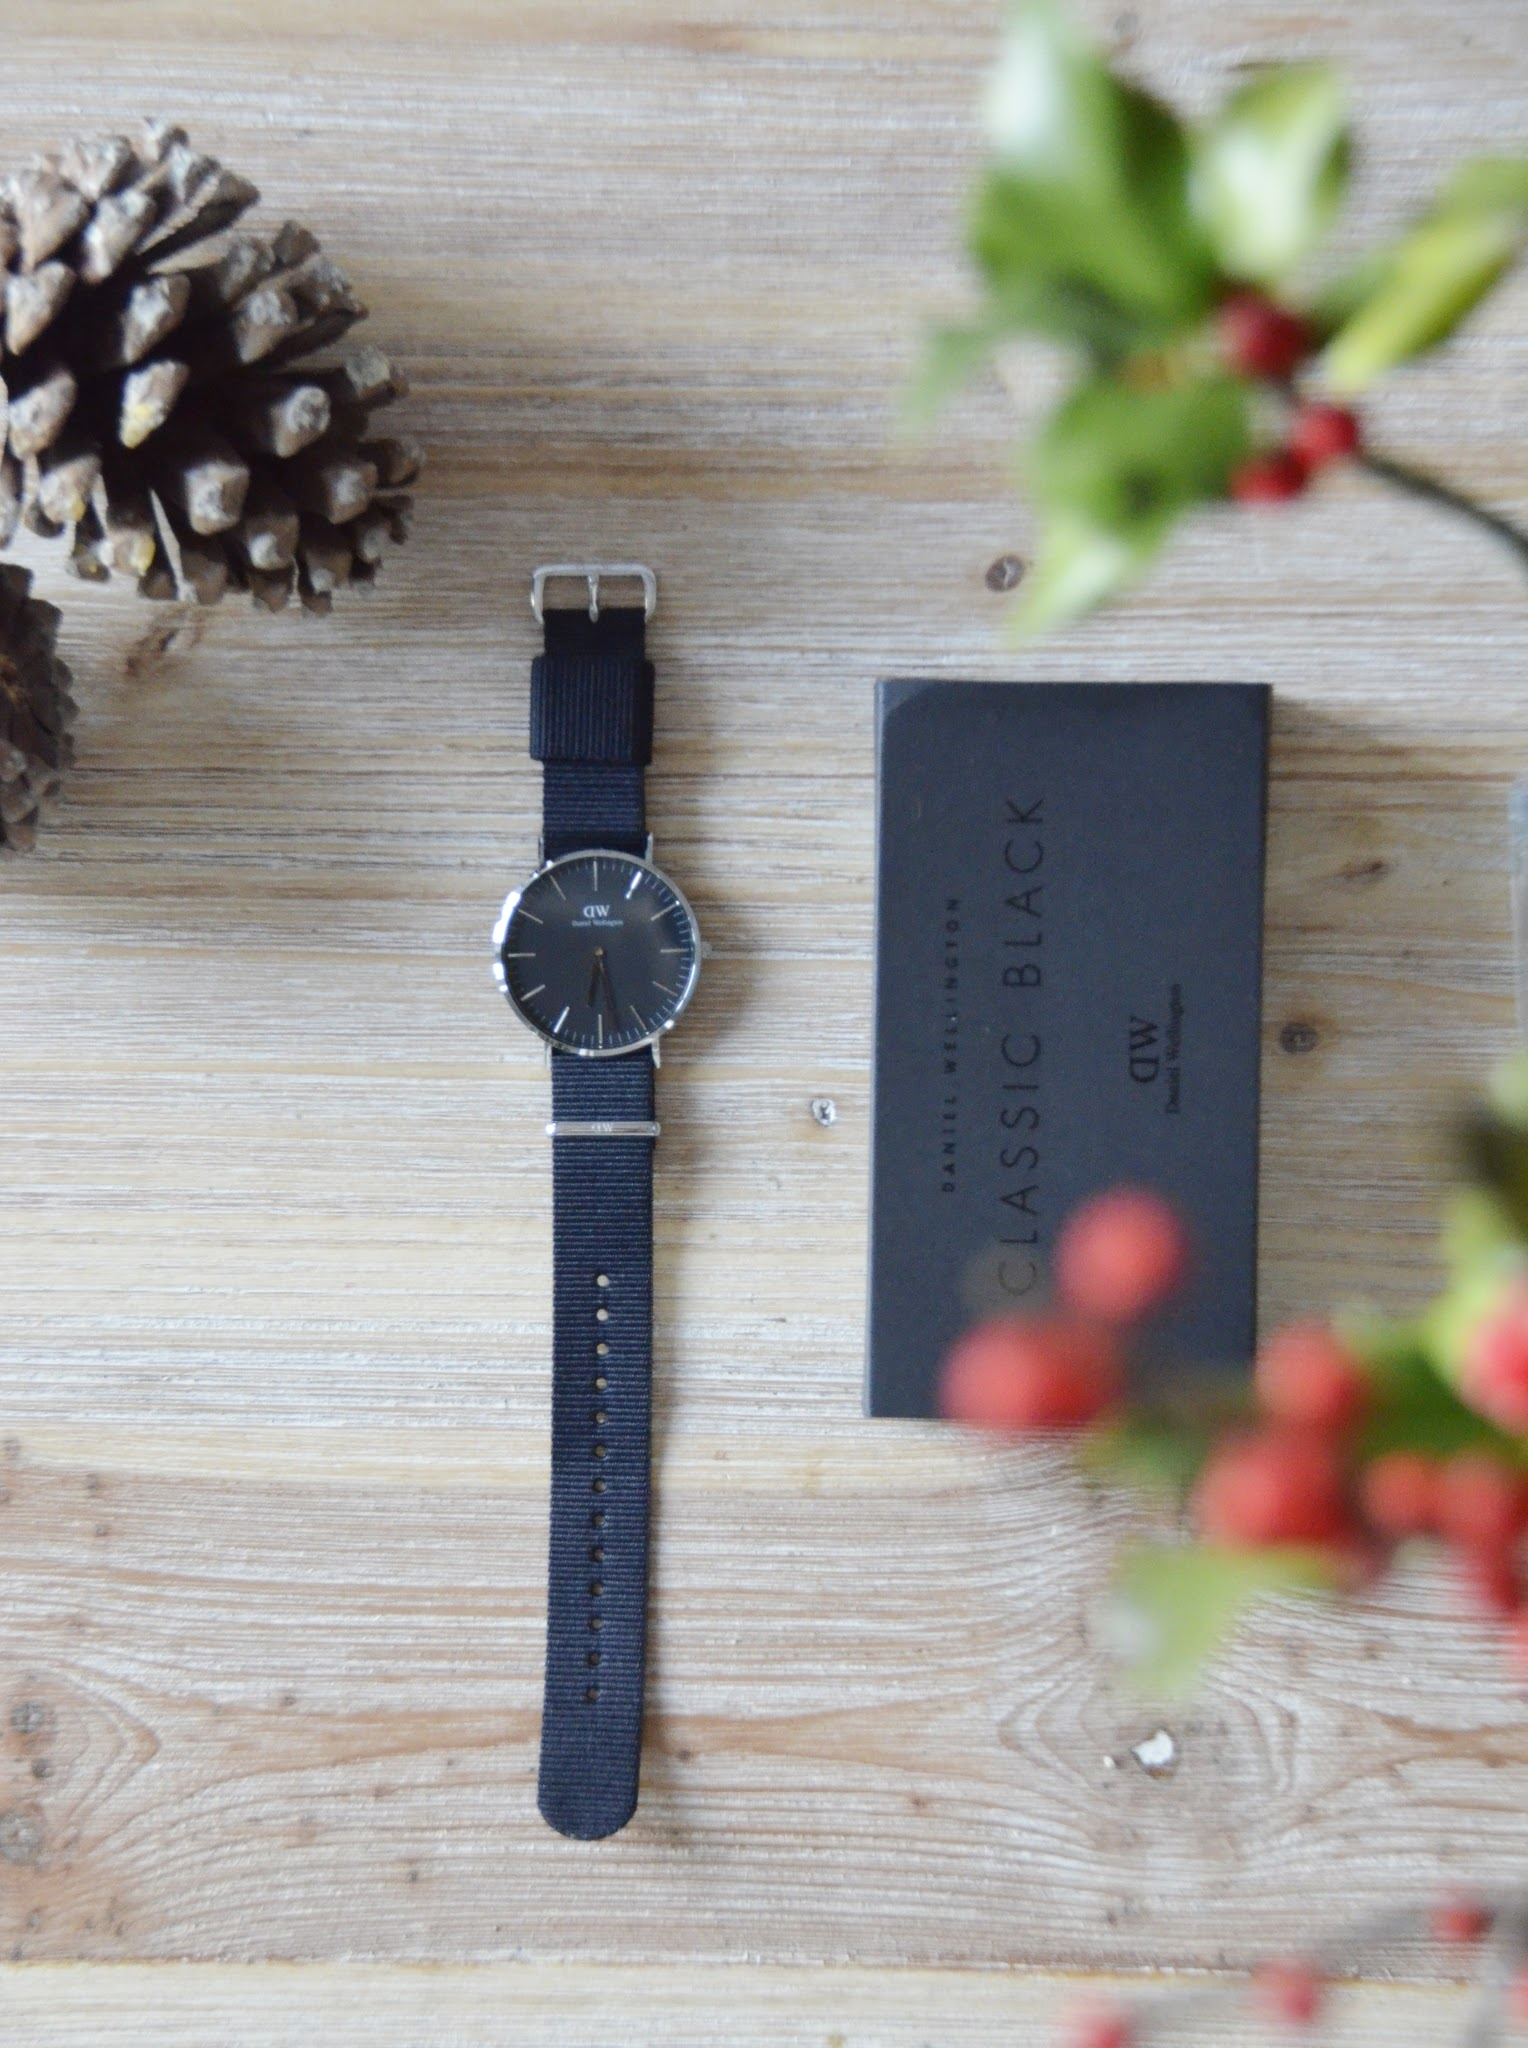 reloj daniel wellington nuevo modelo negro para mujer